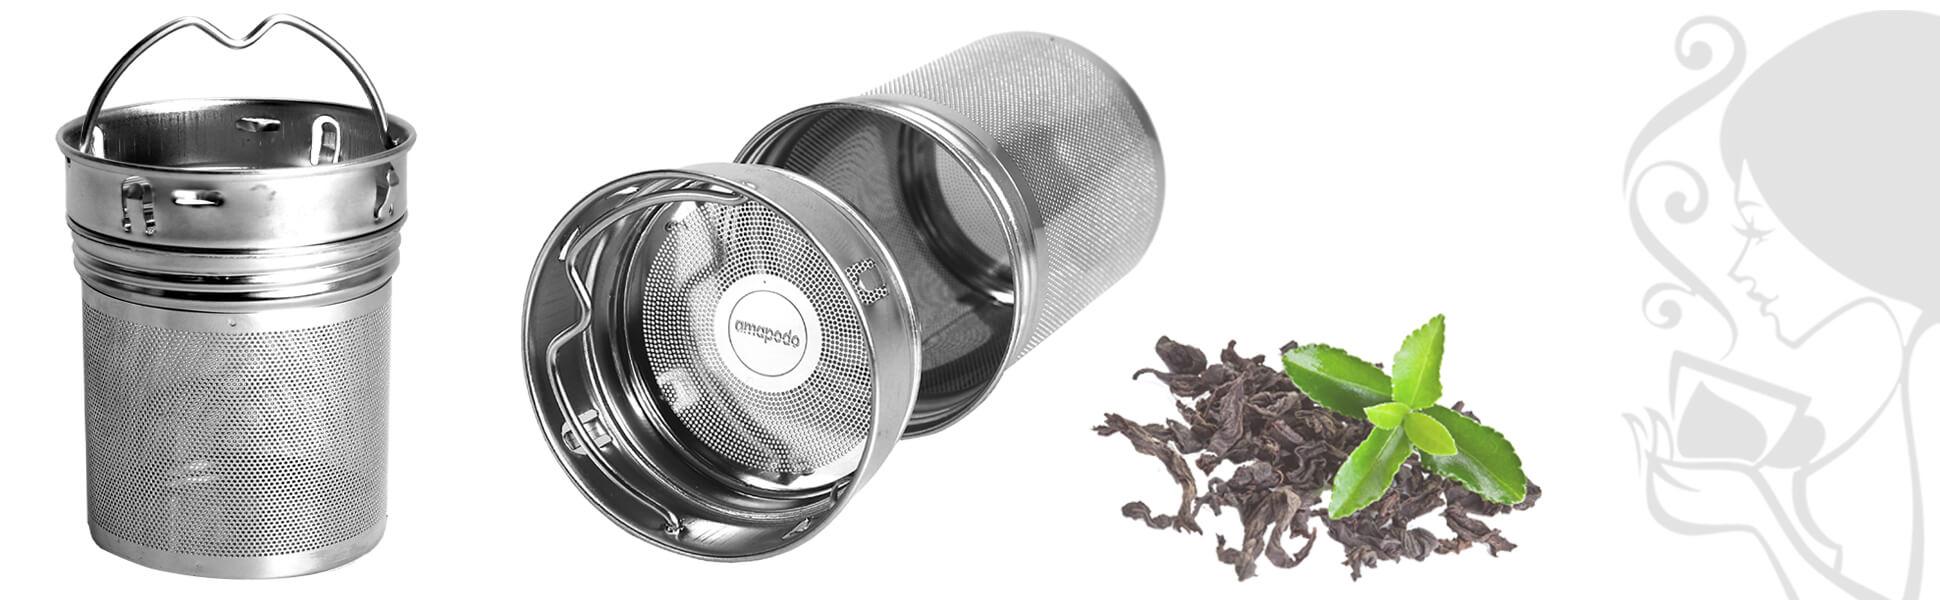 Filtro permanente de té